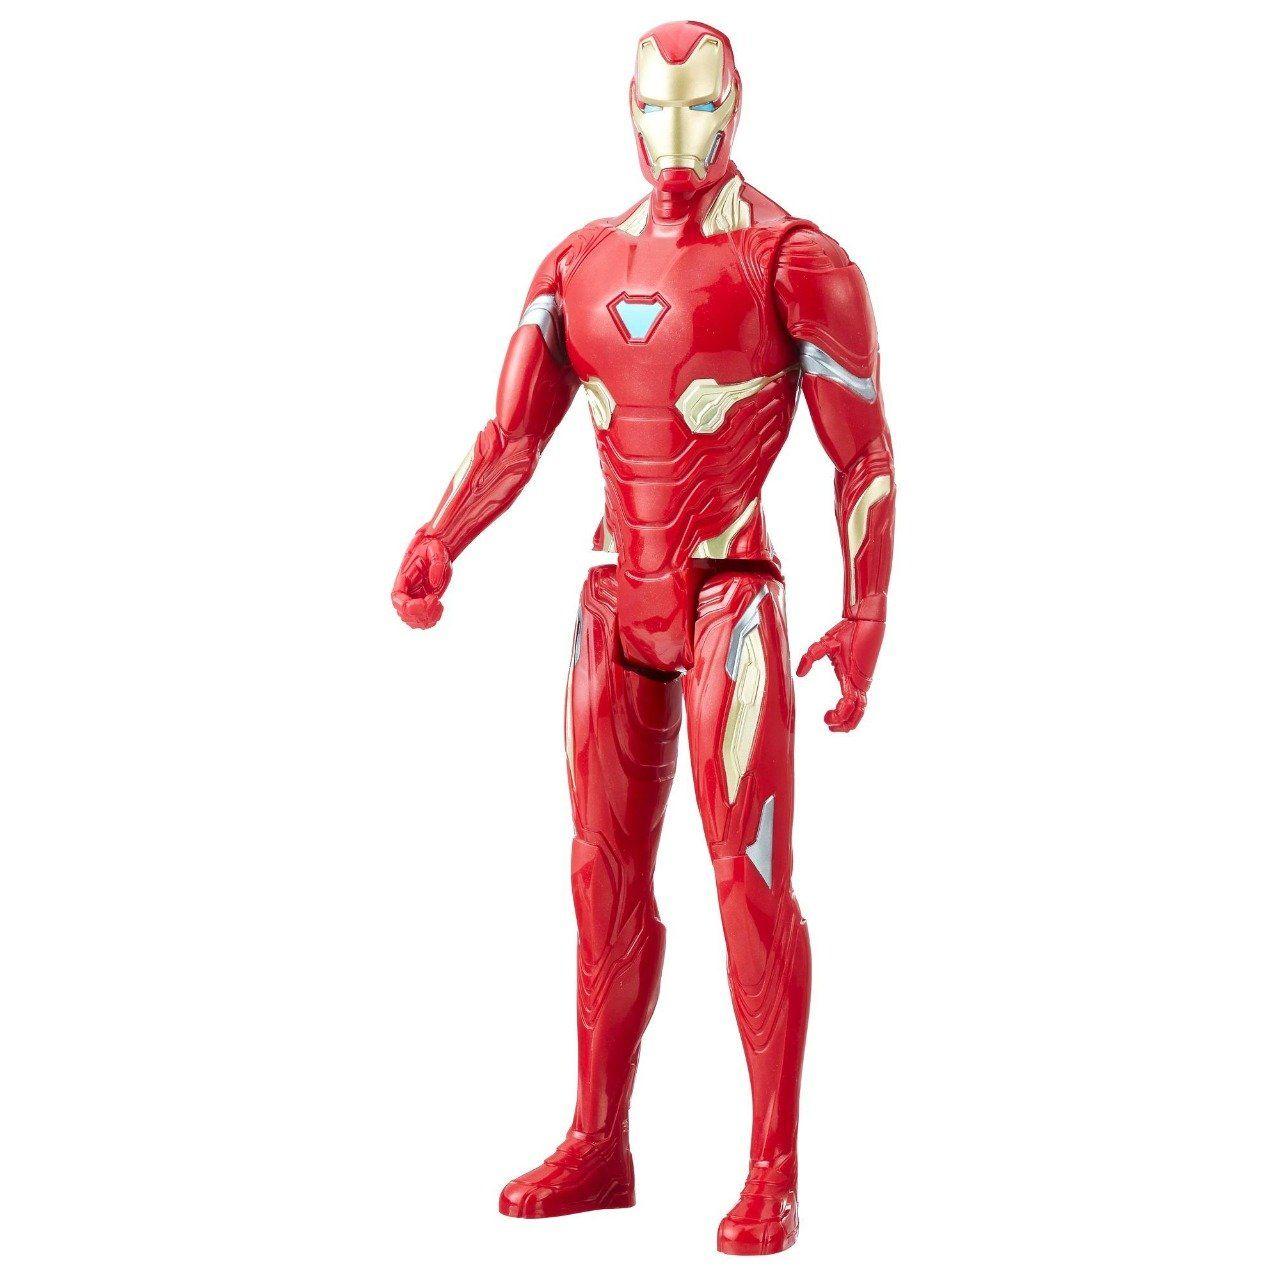 Boneco Homen de Ferro ( Iron Man ) ( Titan Hero Series ): Vingadores Guerra Infinita (Avengers: Infinity War) - Hasbro